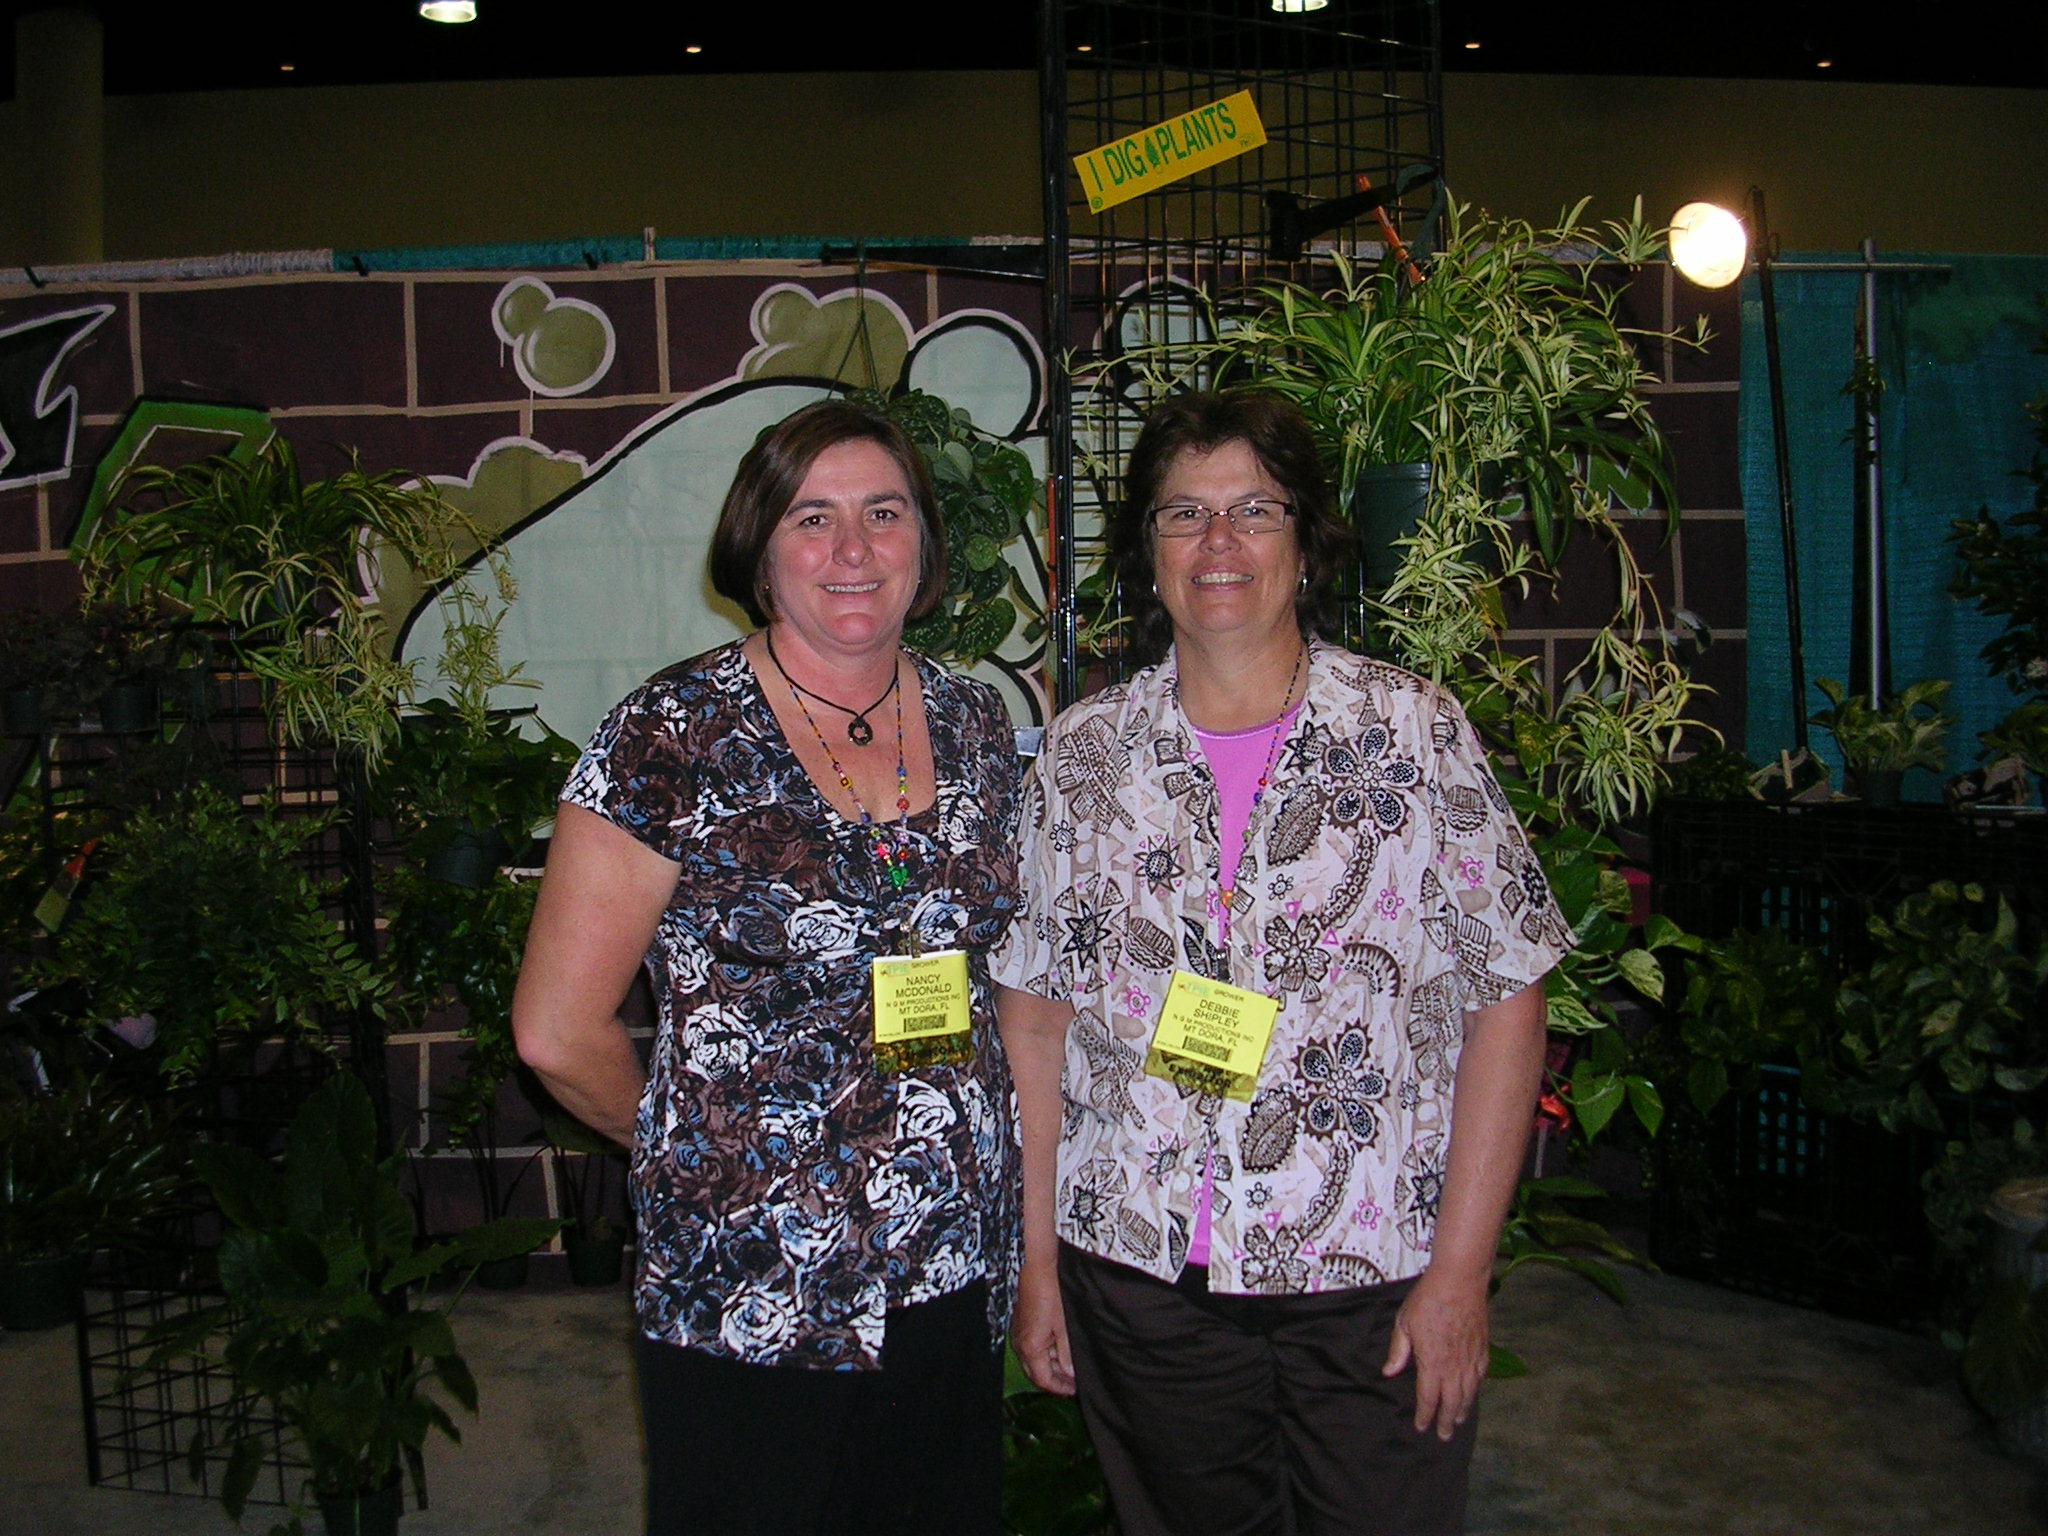 Nancy McDonald and Debbie Shipley